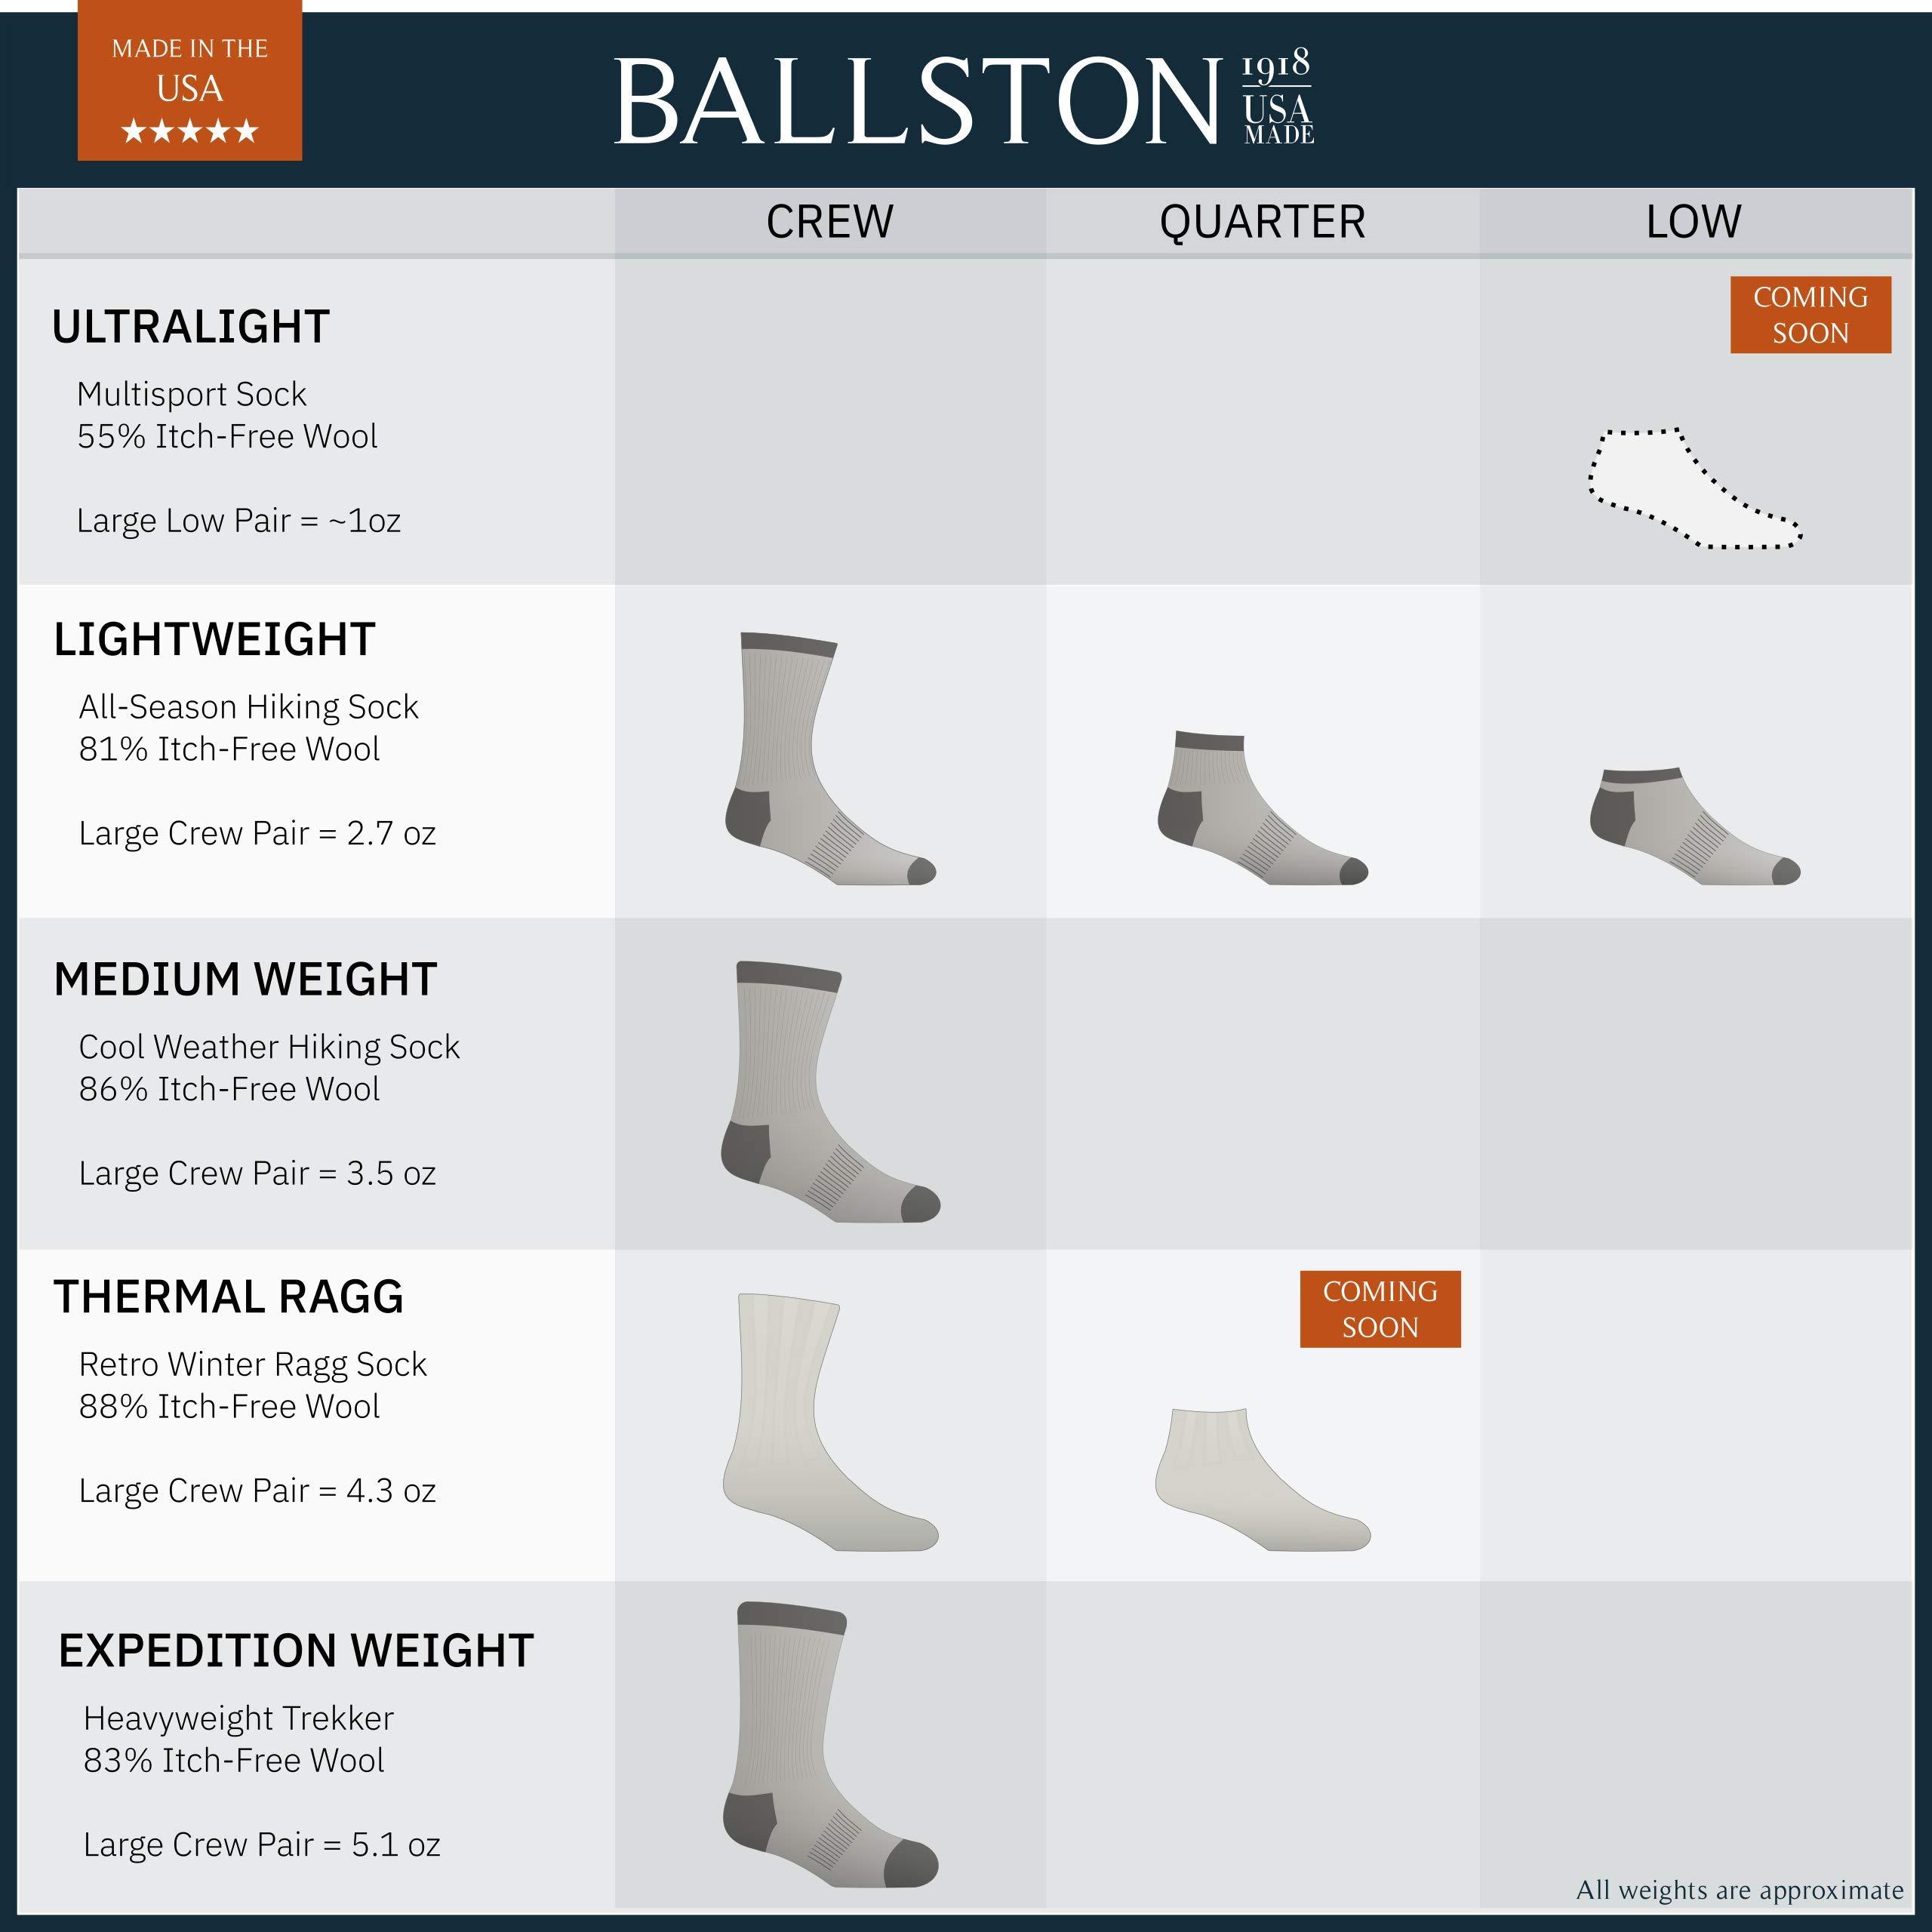 Ballston